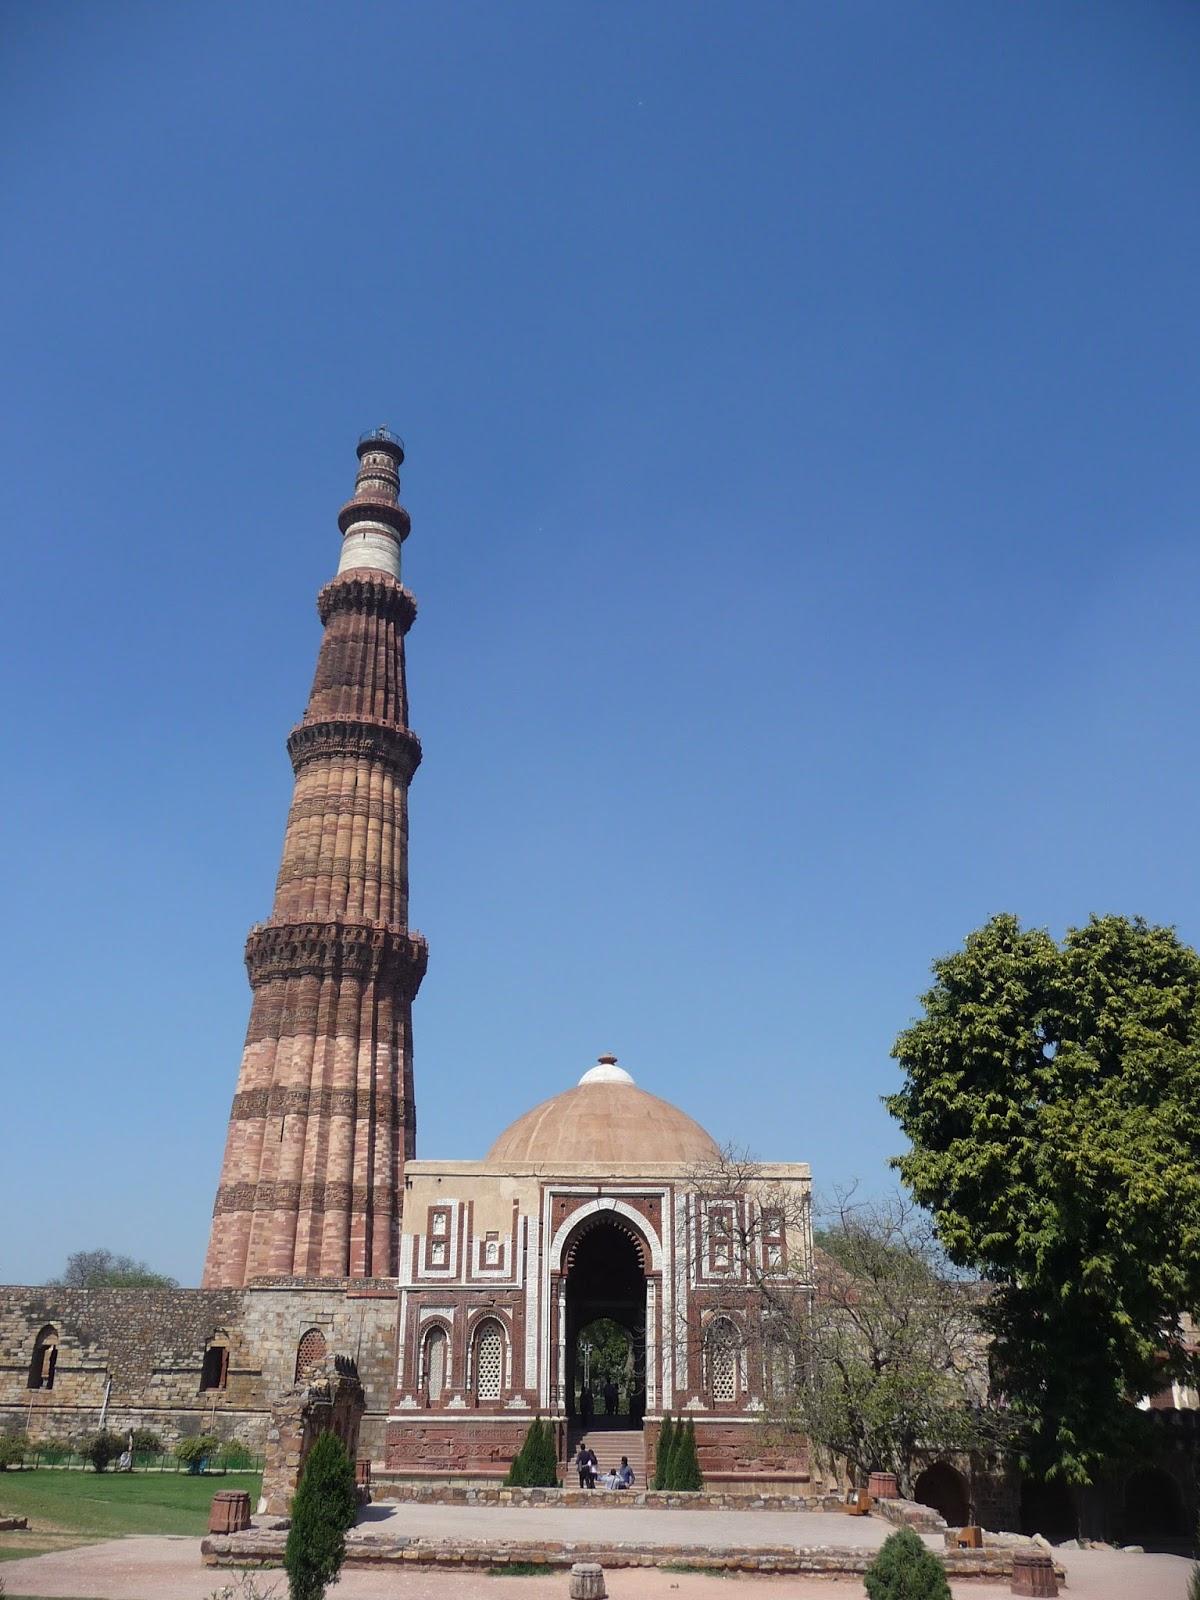 Line Drawing Of Qutub Minar : Delhi alai darwaza in qutub complex the journey of a